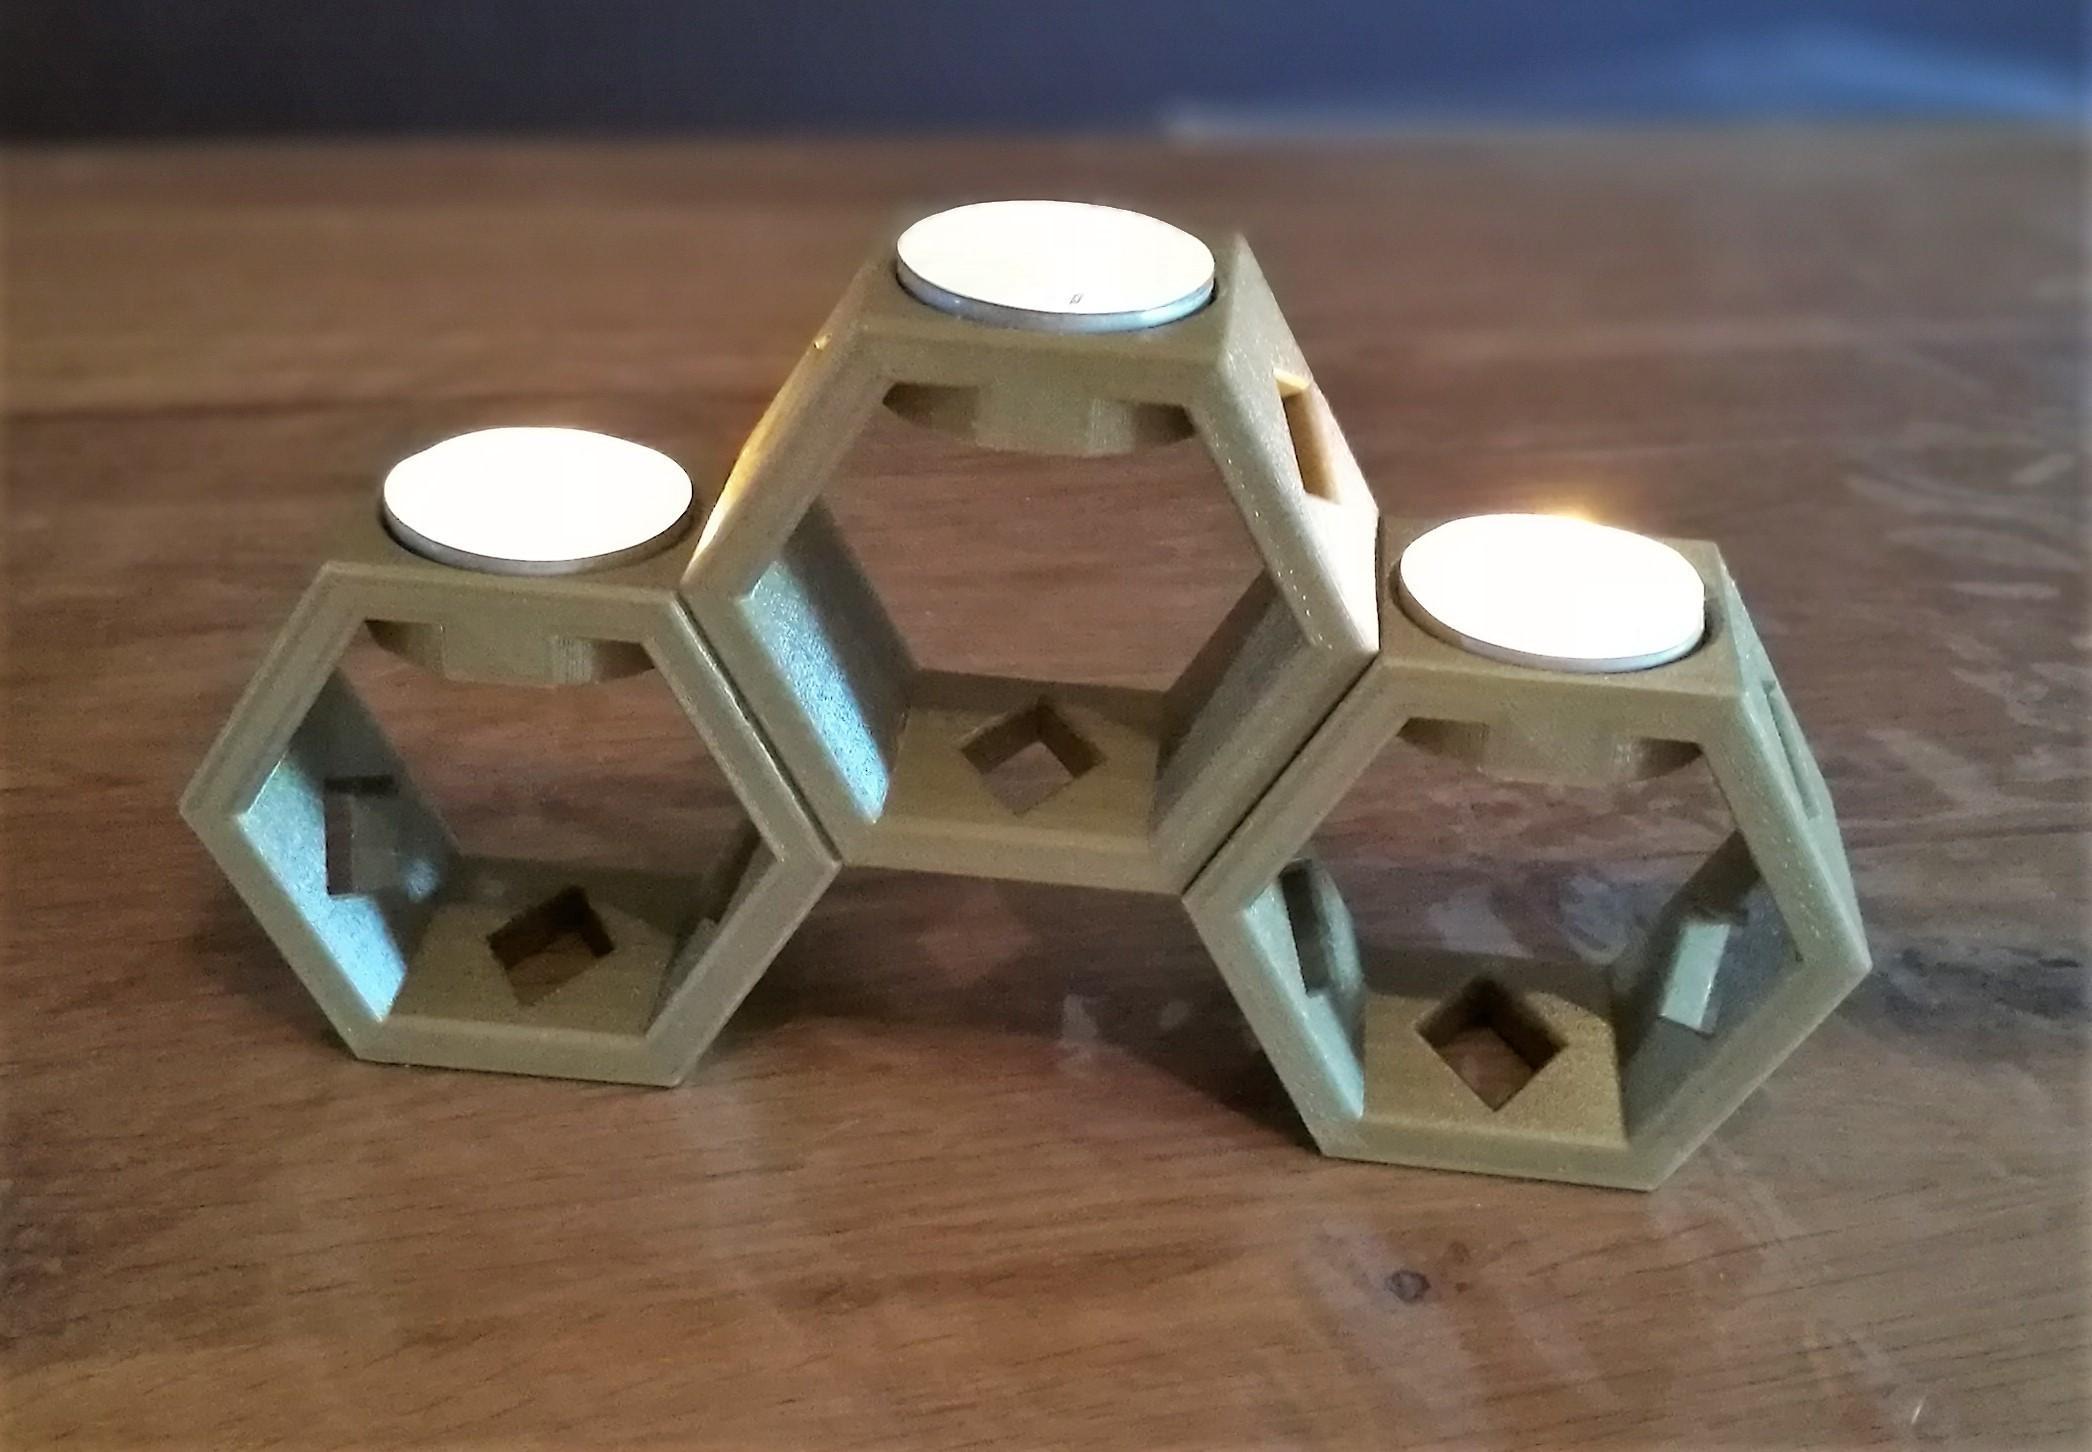 3.jpg Download free STL file Honeycomb tealight holder • Model to 3D print, OC3D